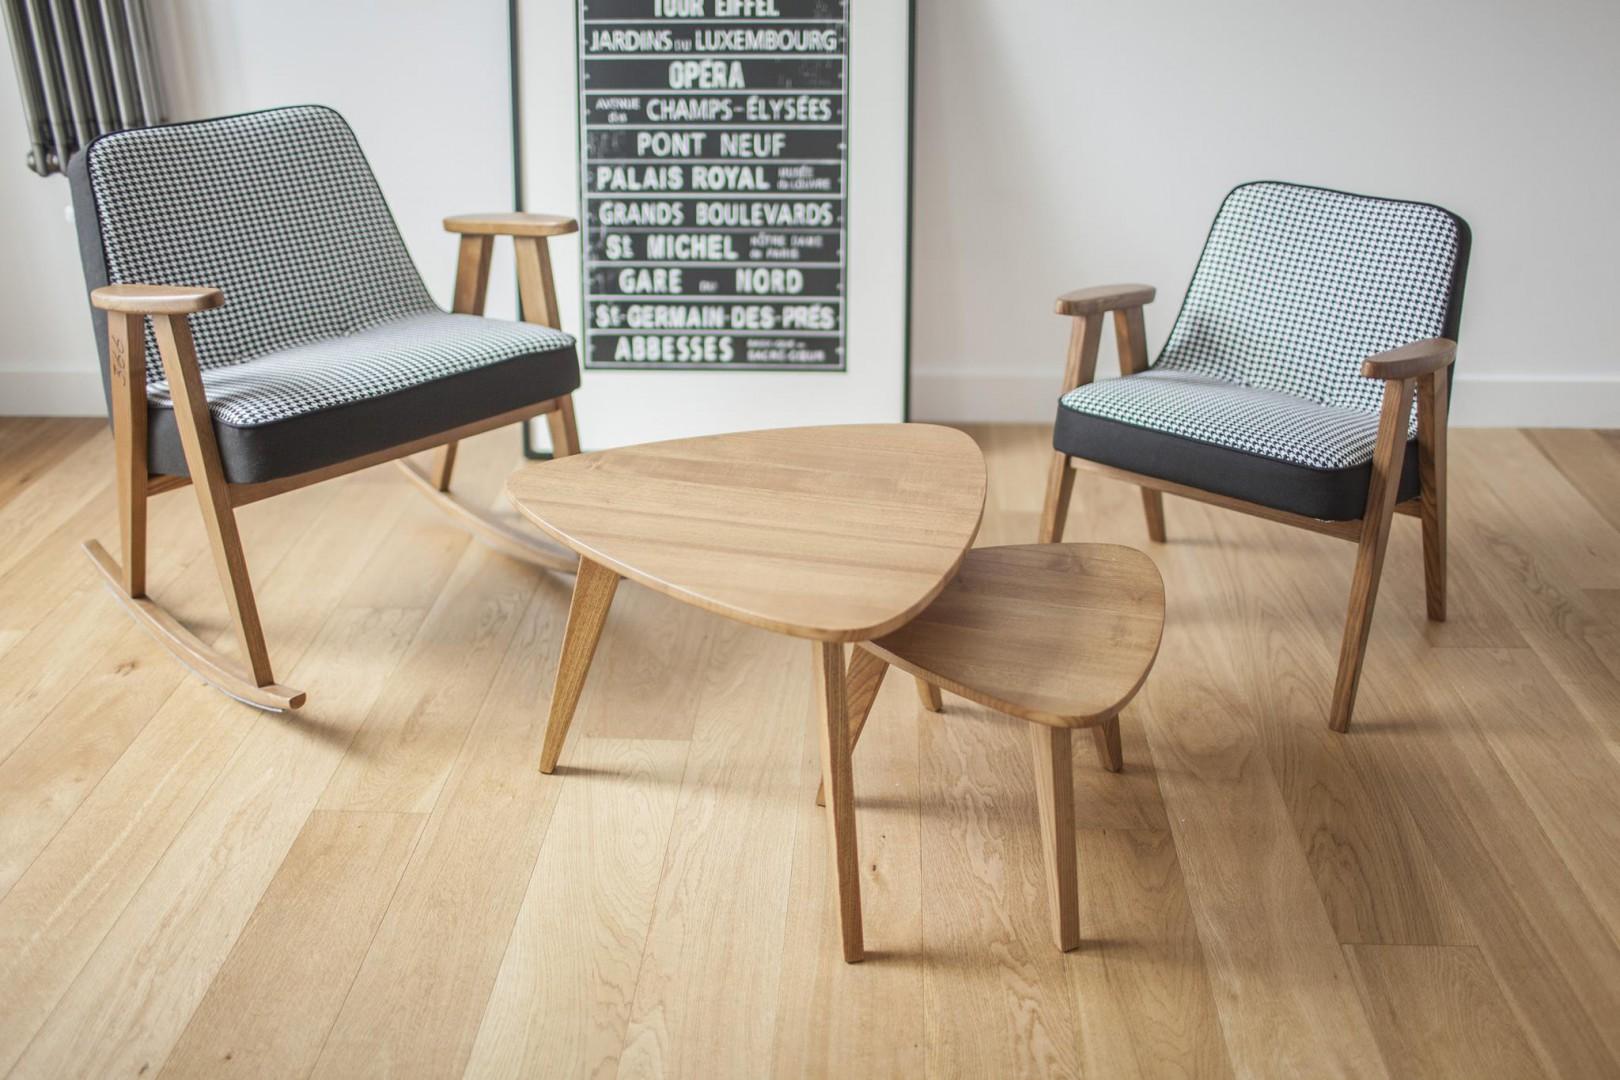 Fotele 366 marki 366 Concept. Fot. Euforma